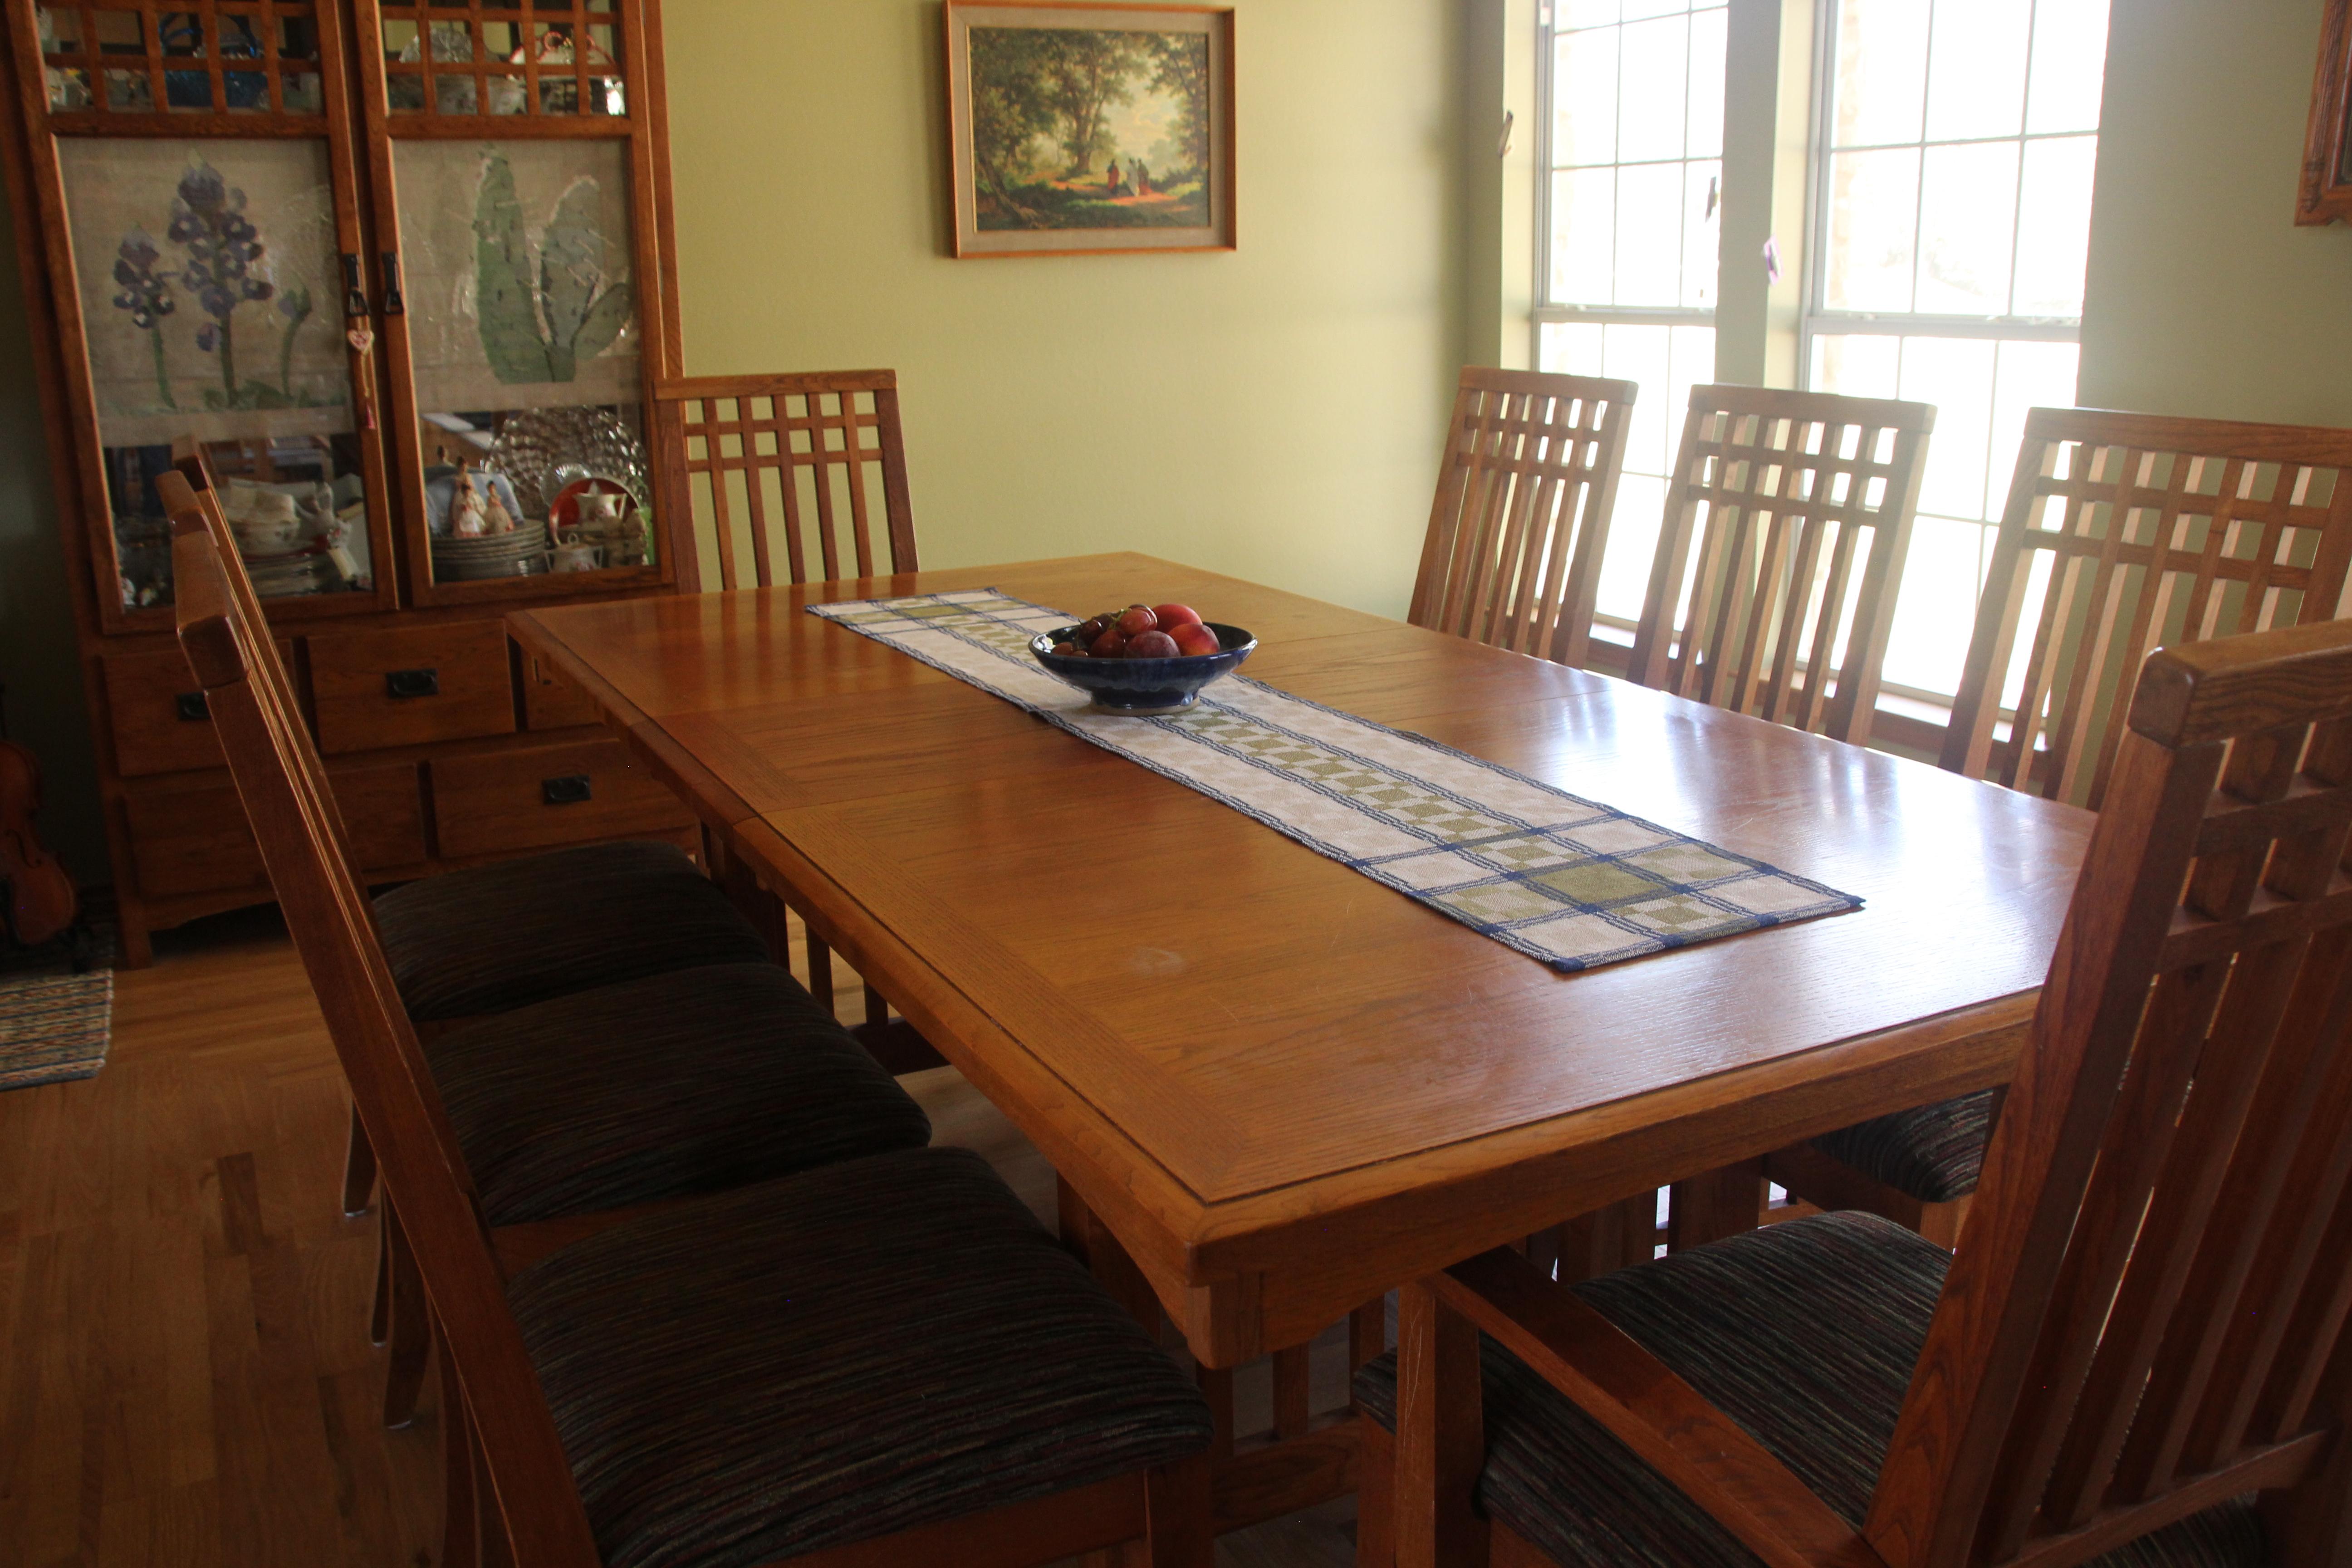 Handwoven linen table runner in a handweaver's home.